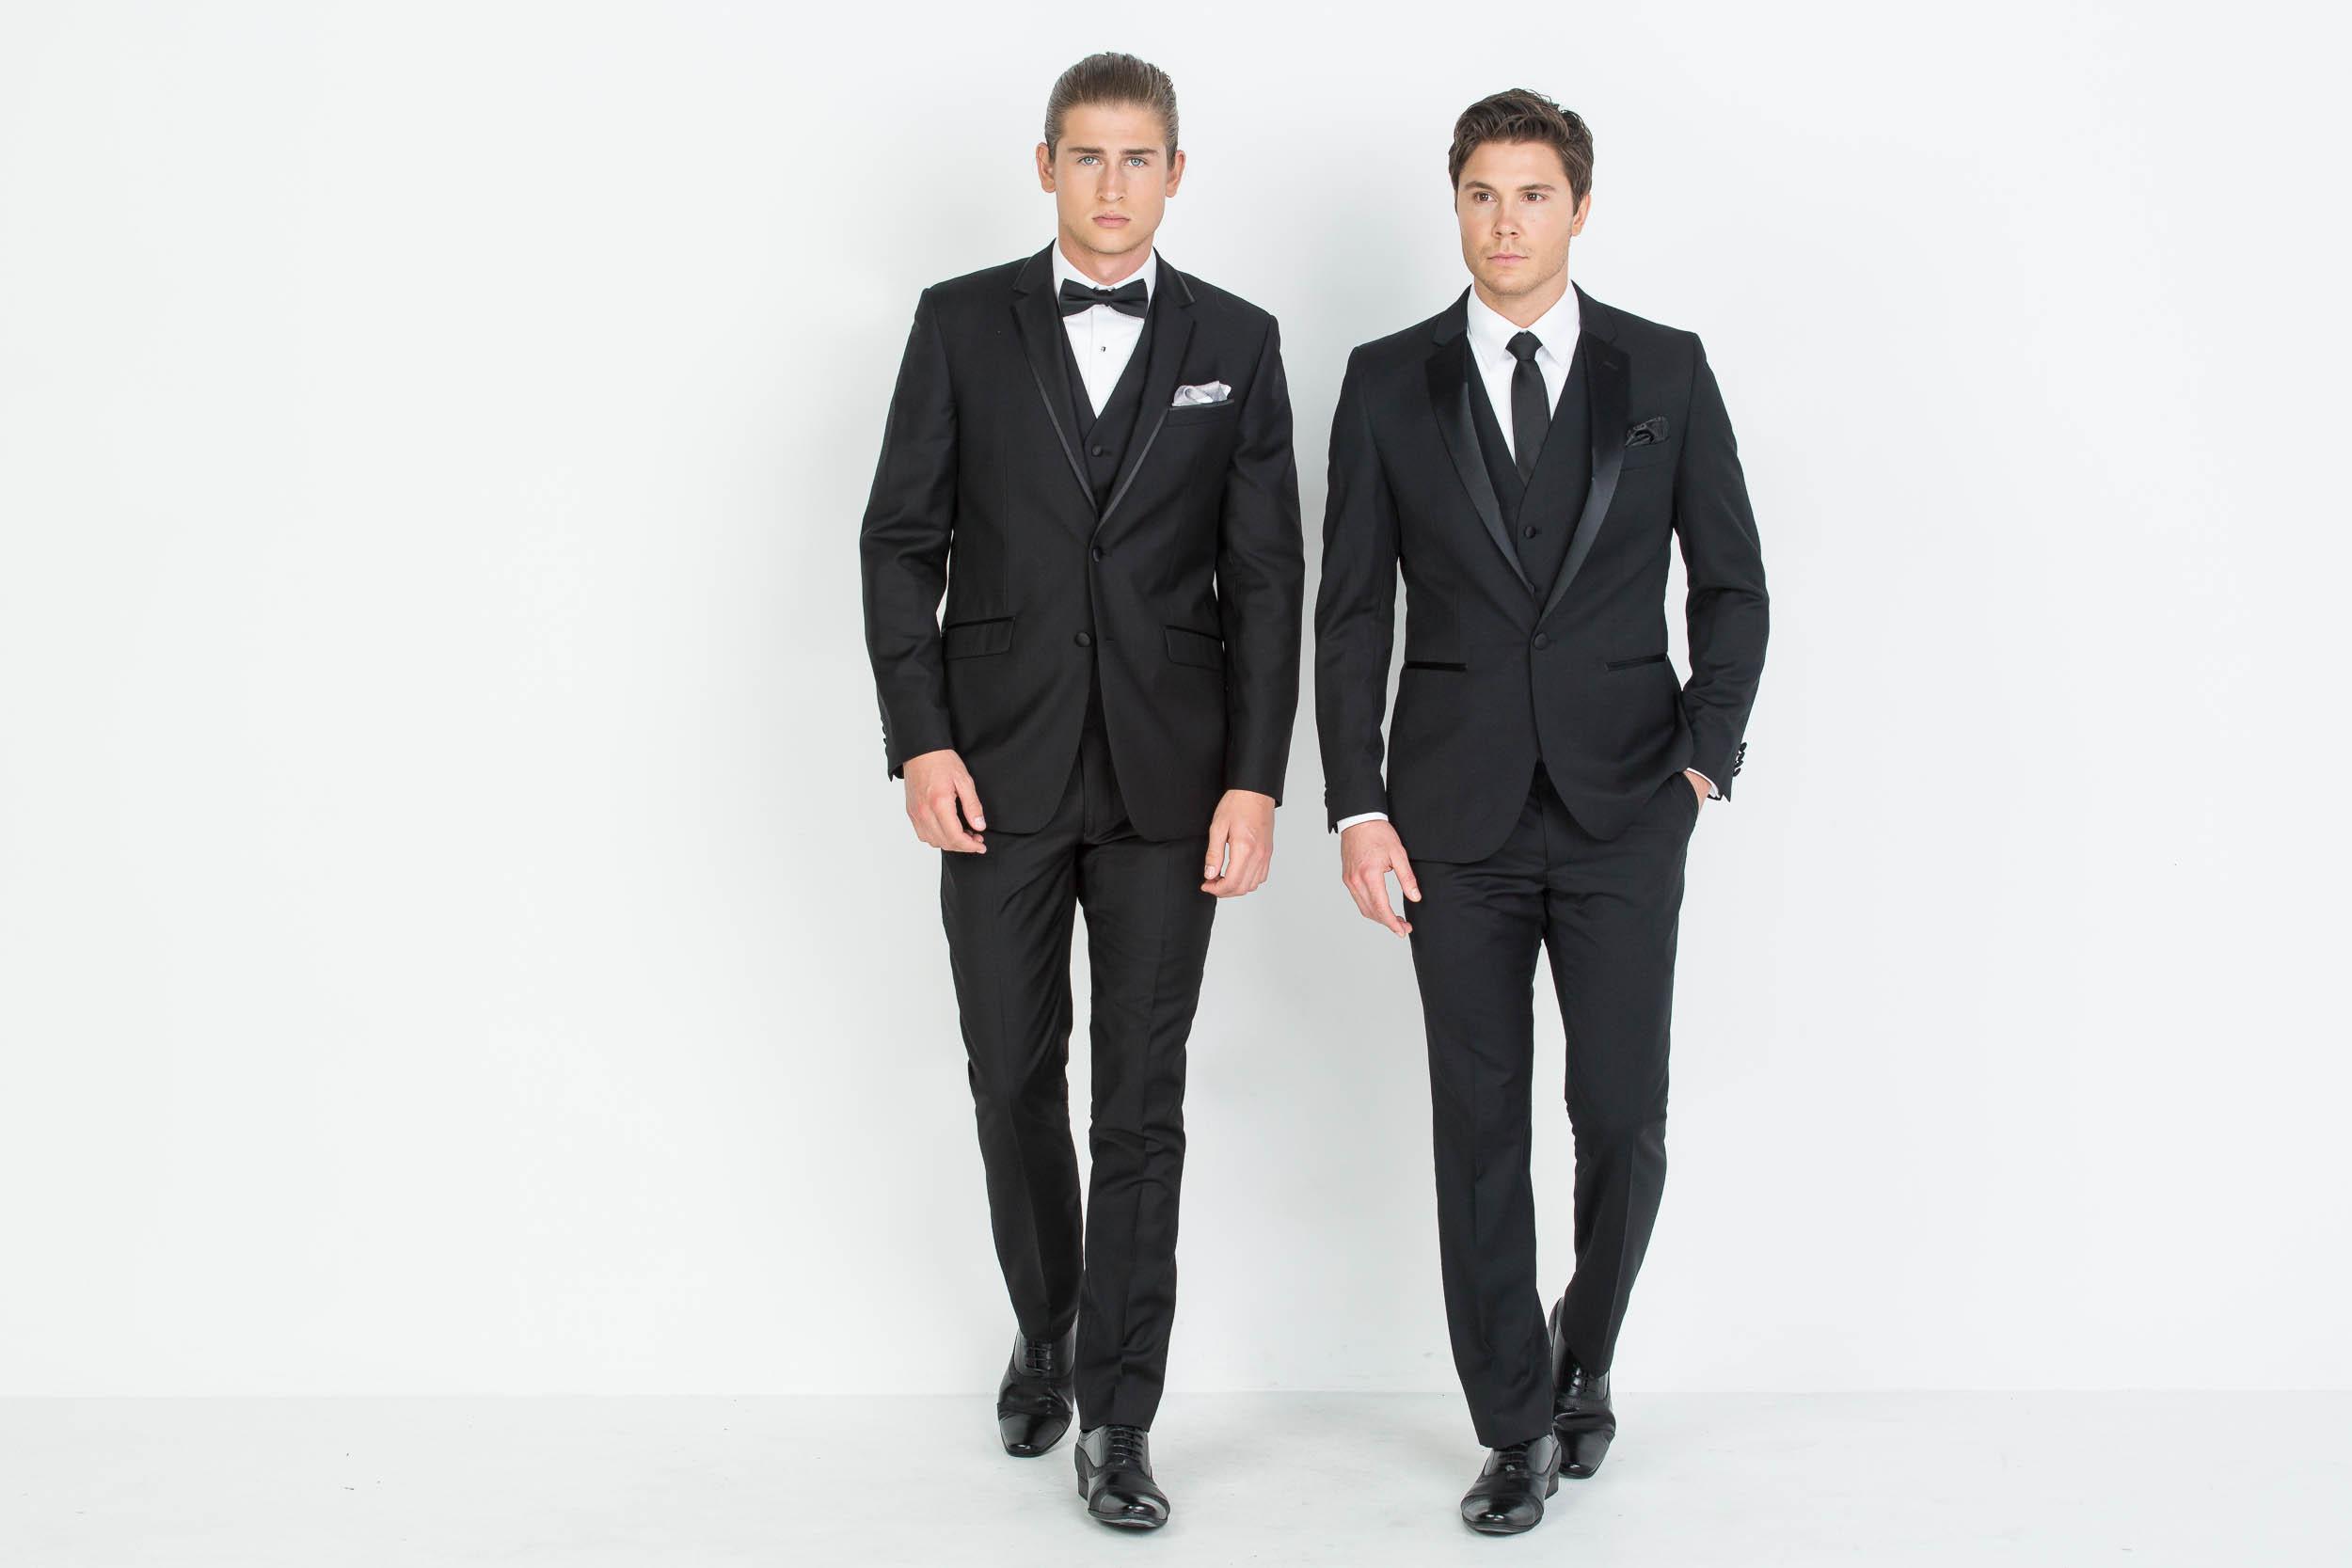 Commercial Mens Fashion Photography by Nick Walters for Ferrari Formalwear.jpg